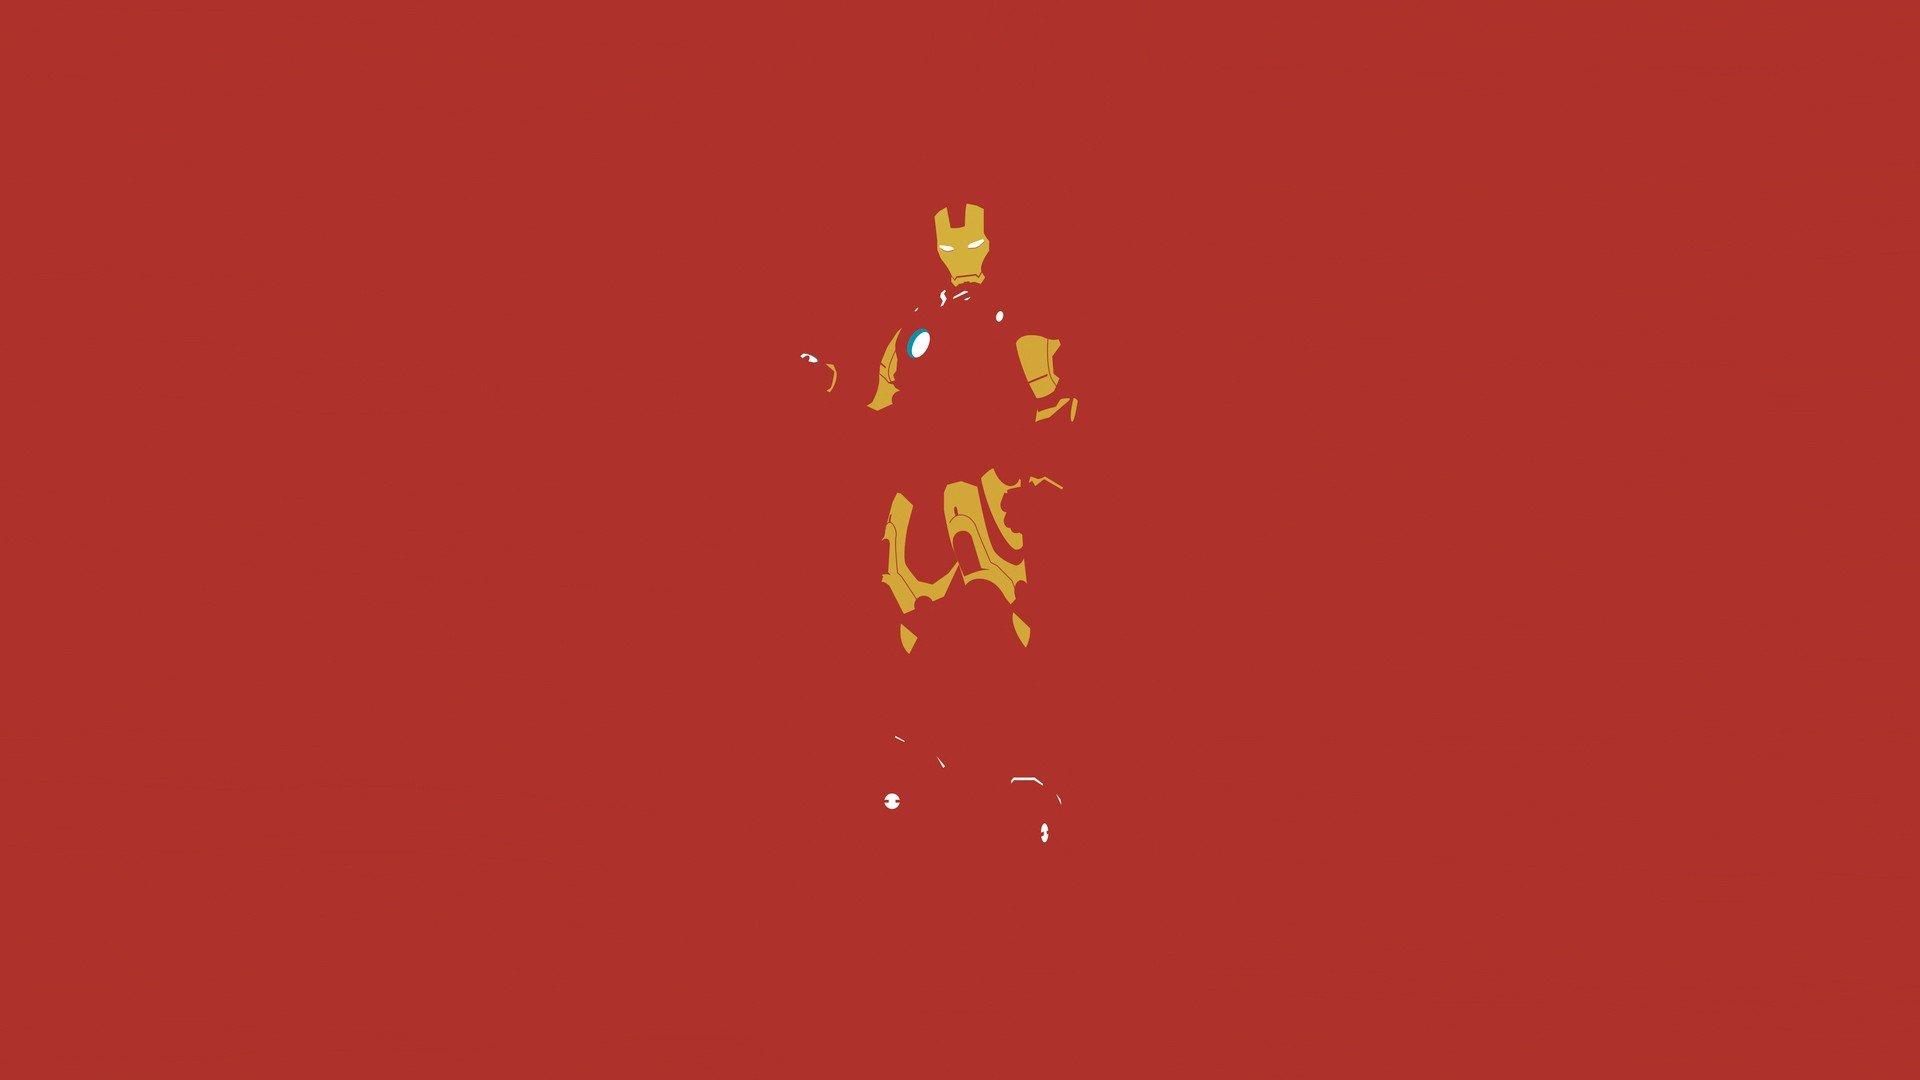 Free Download Iron Man Wallpaper Id164 Hd 1080p For Desktop